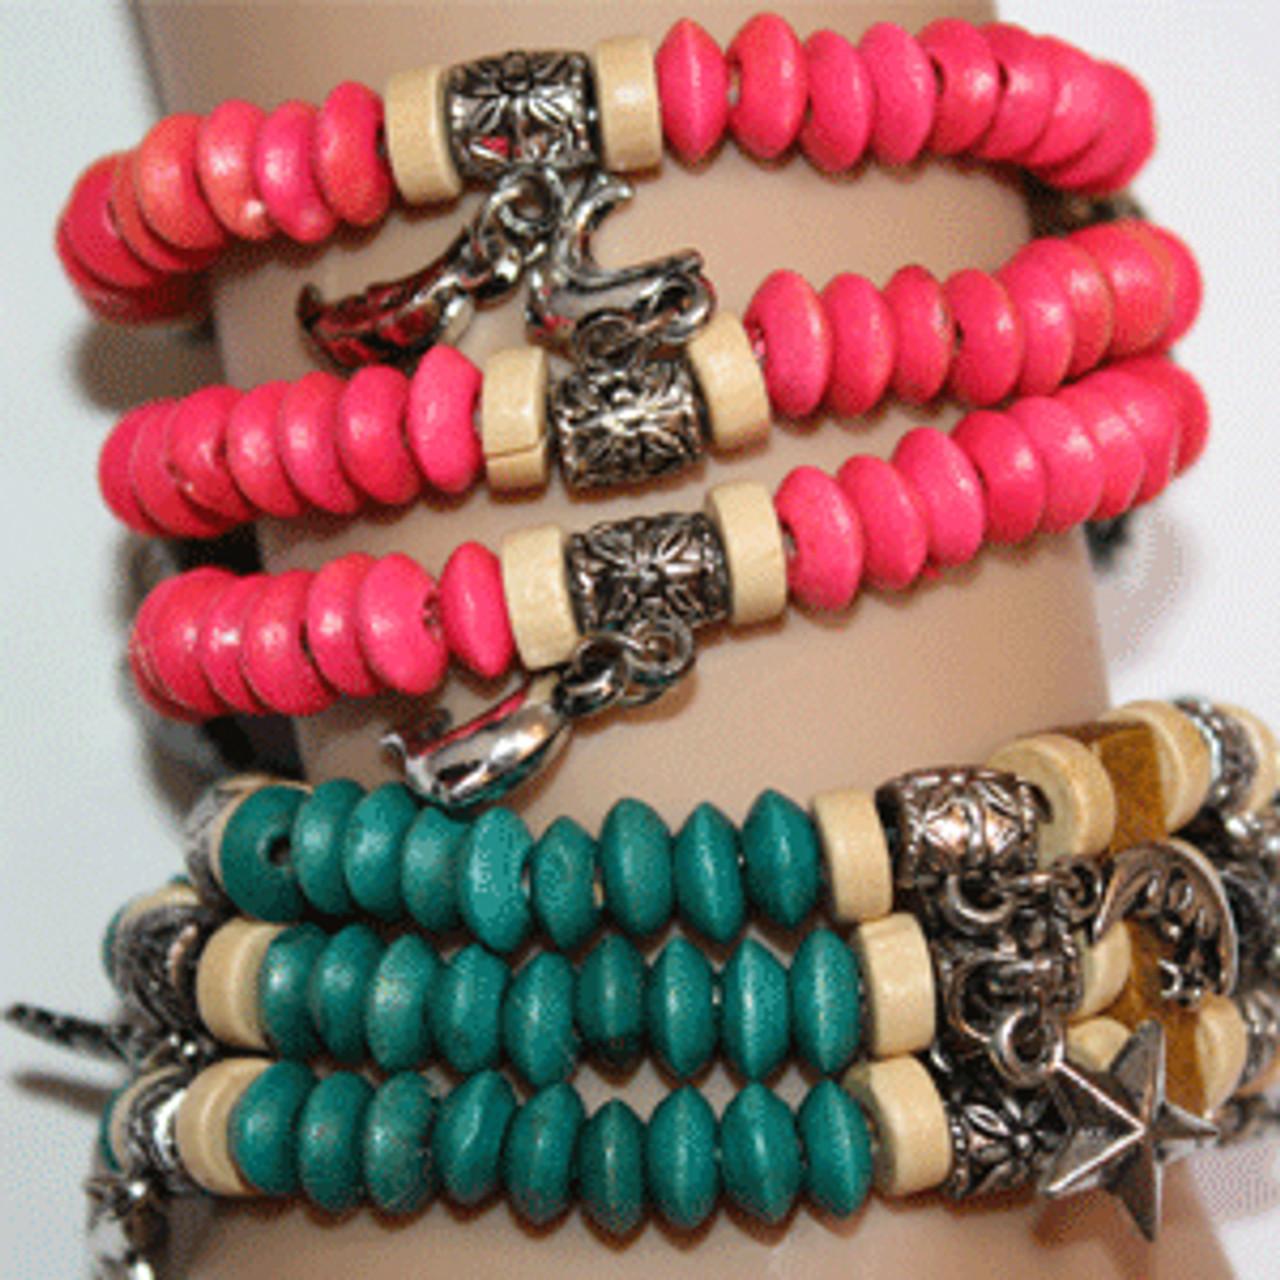 Wholesale bead charm bracelet